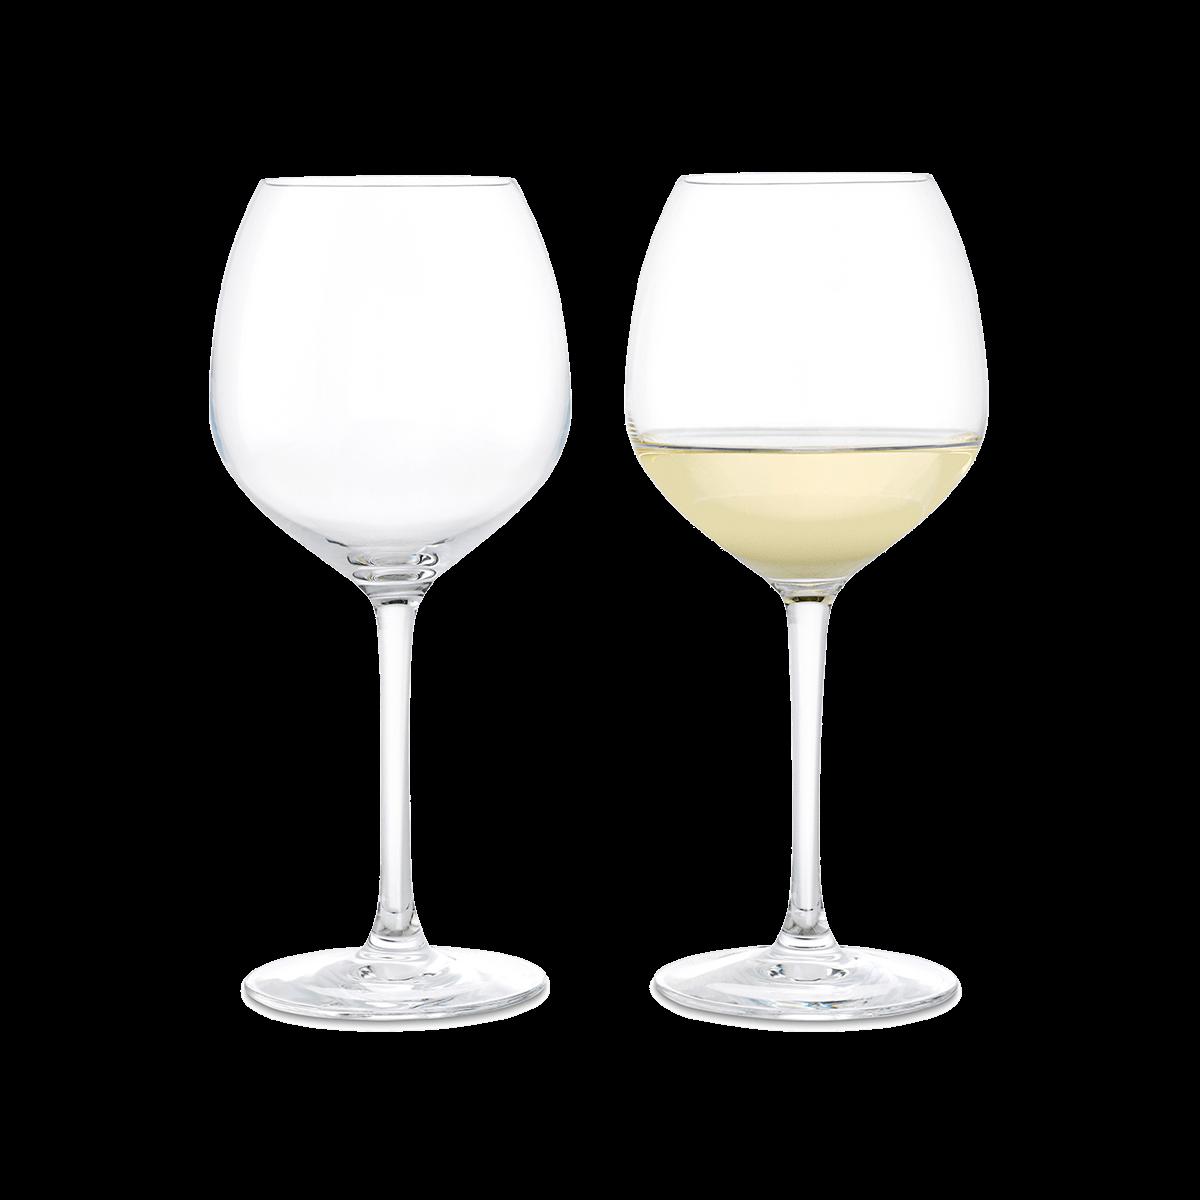 ROSENDAHL Premium hvidvinsglas 54 cl 2 stk